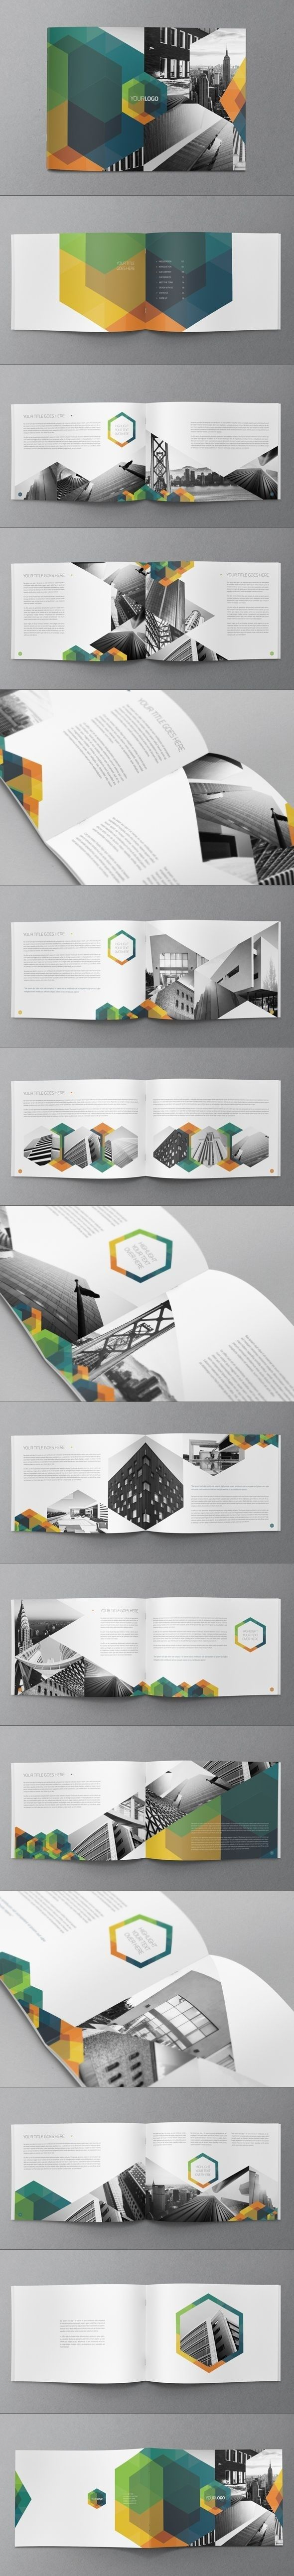 Hexo Brochure Design by Abra Design   Graphic Design in Geometry